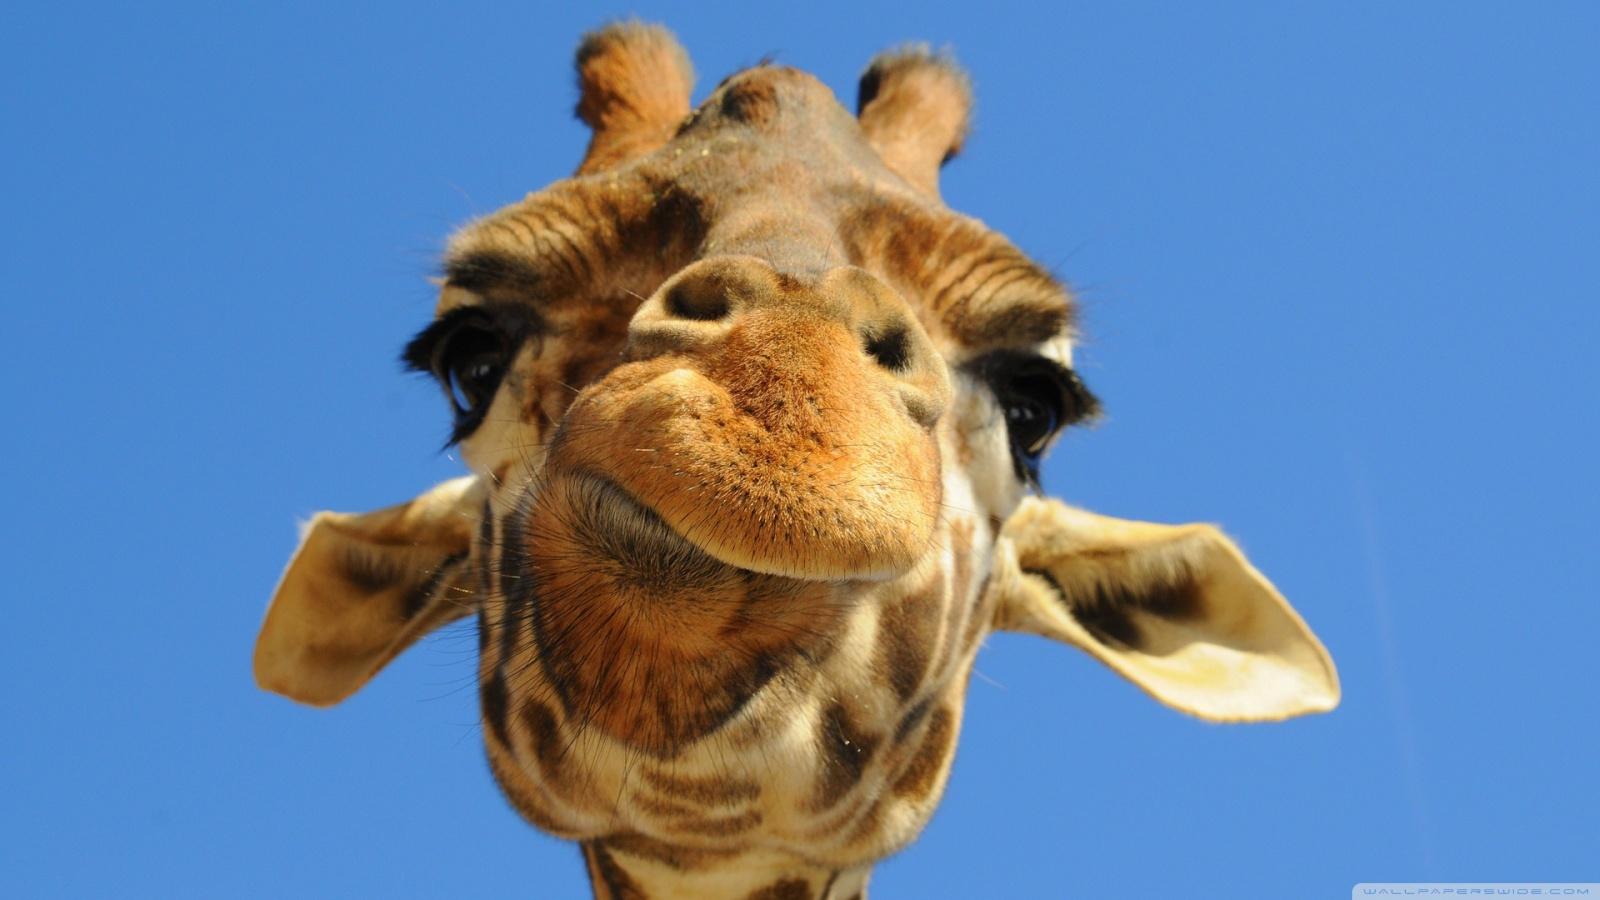 Giraffe Wallpaper 21   1600 X 900 stmednet 1600x900